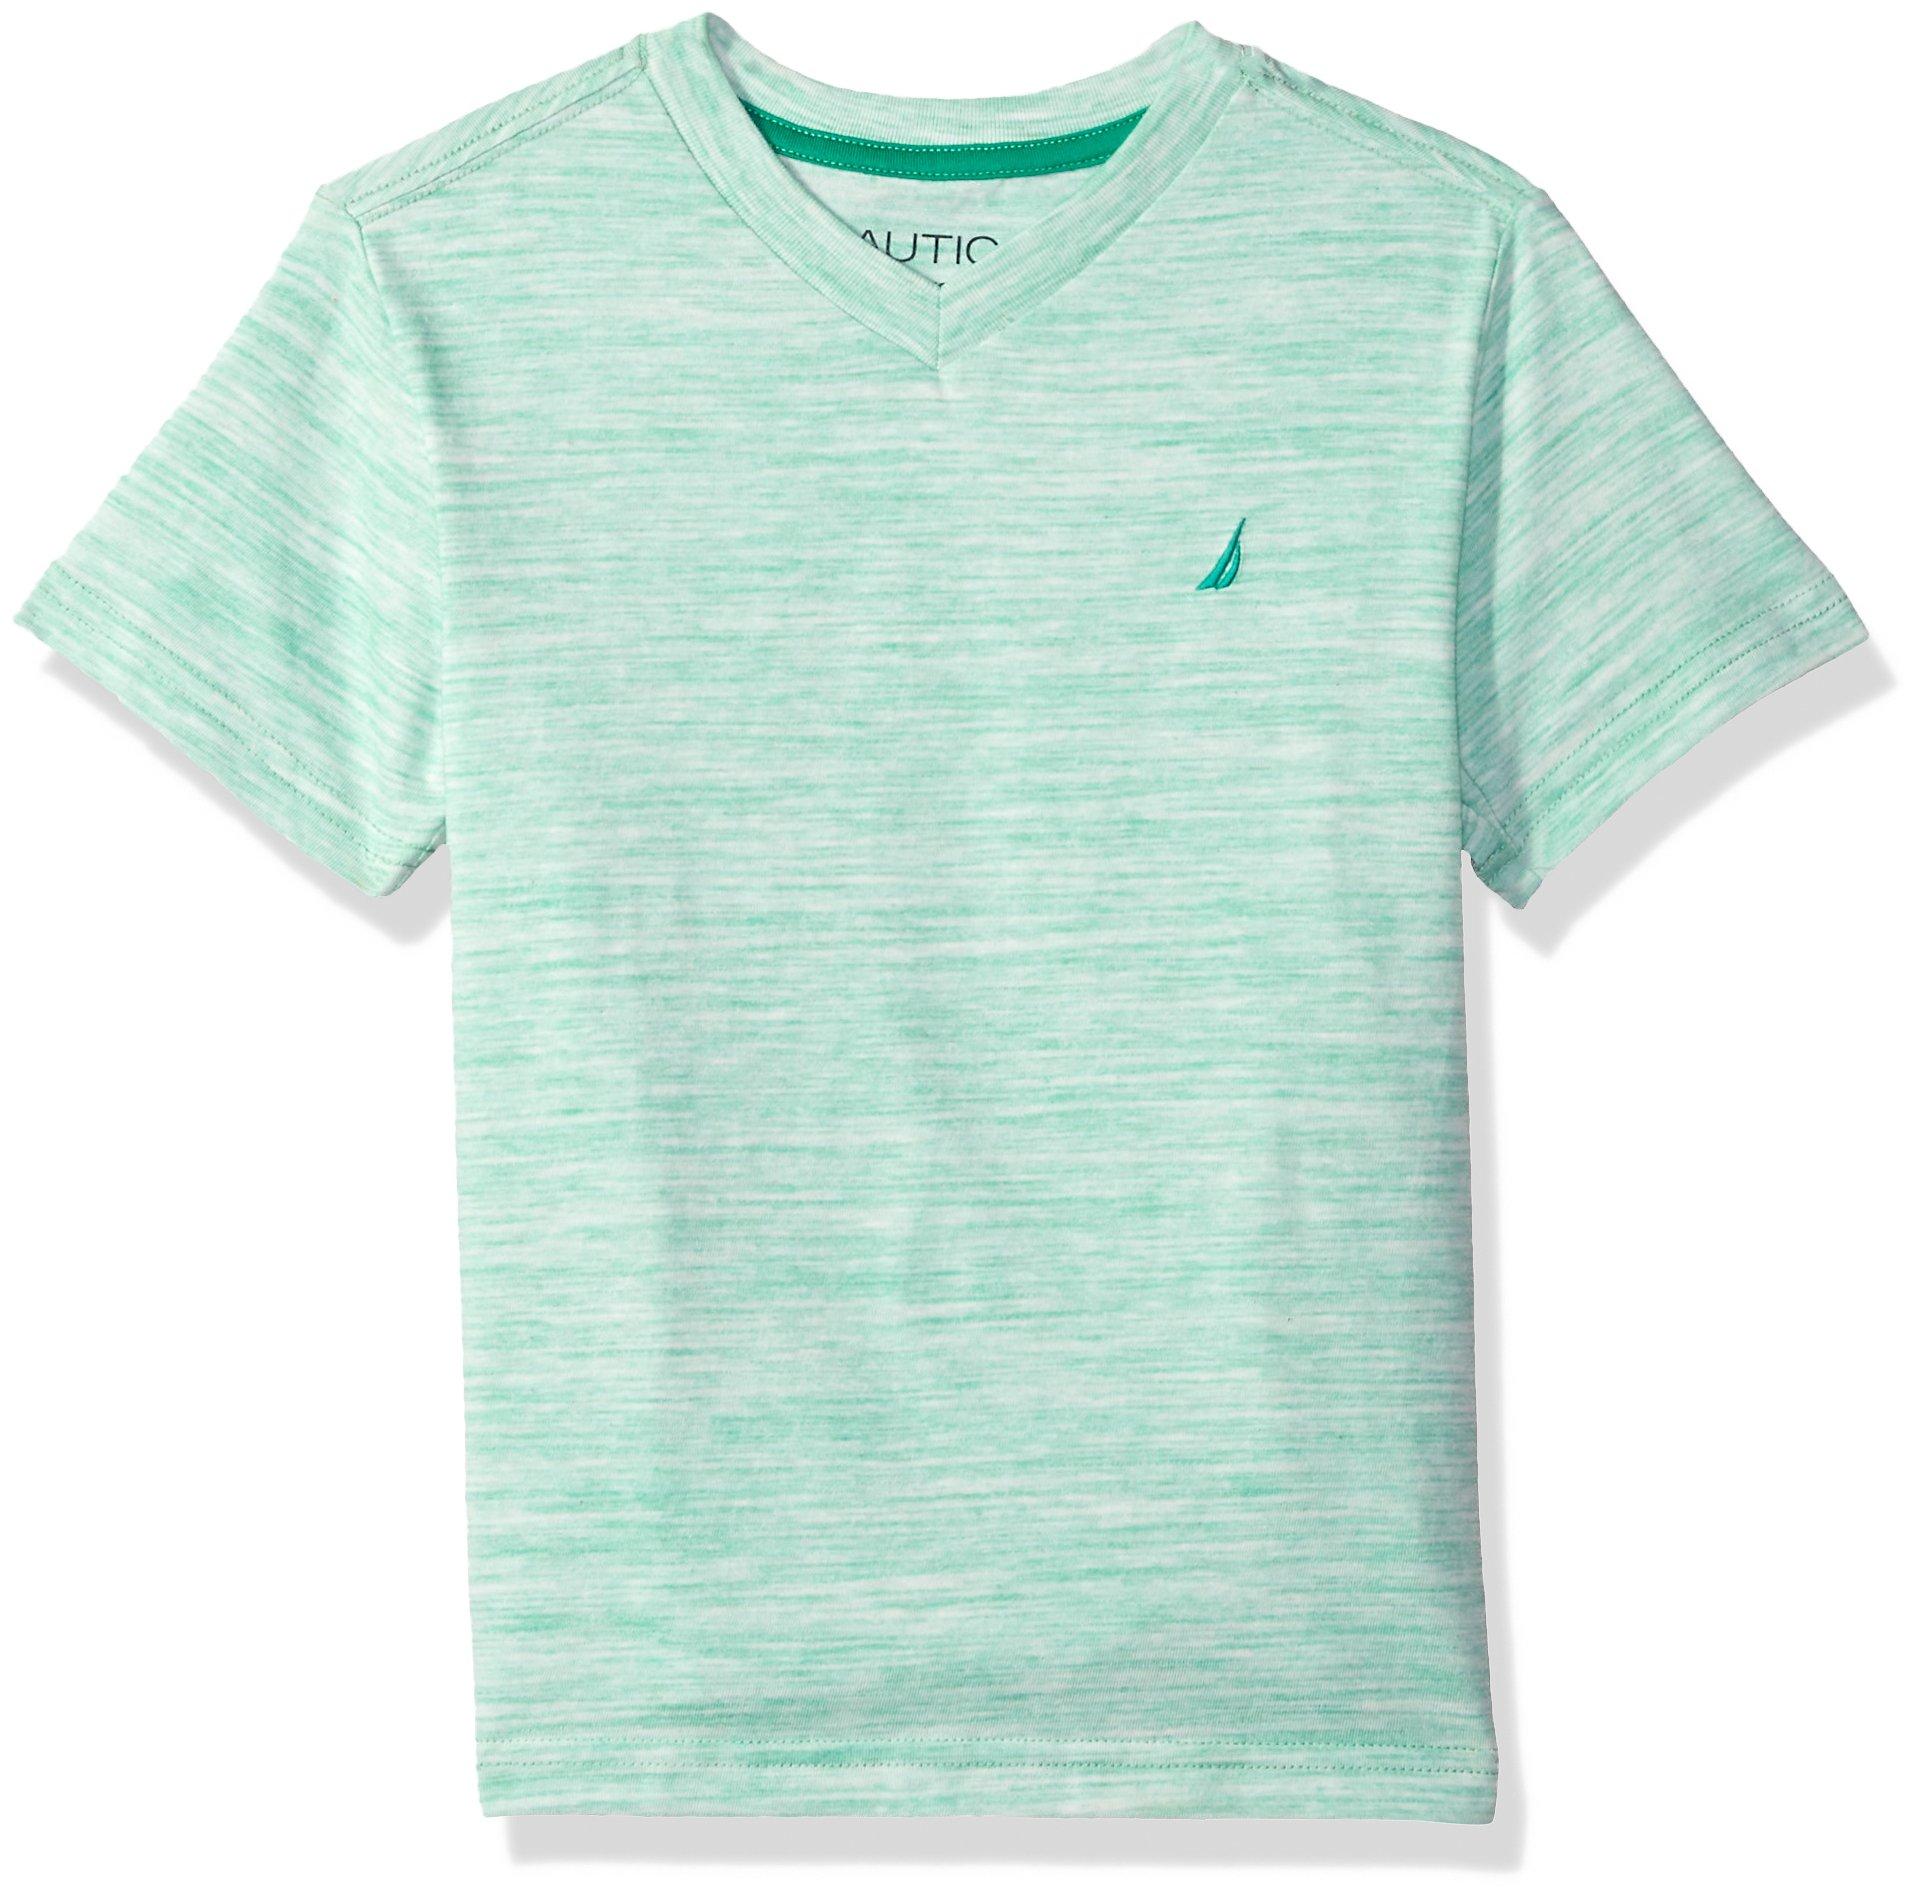 542de680 Galleon - Nautica Boys' Little Short Sleeve Solid V-Neck T-Shirt, Channel  Spearmint, 5/6